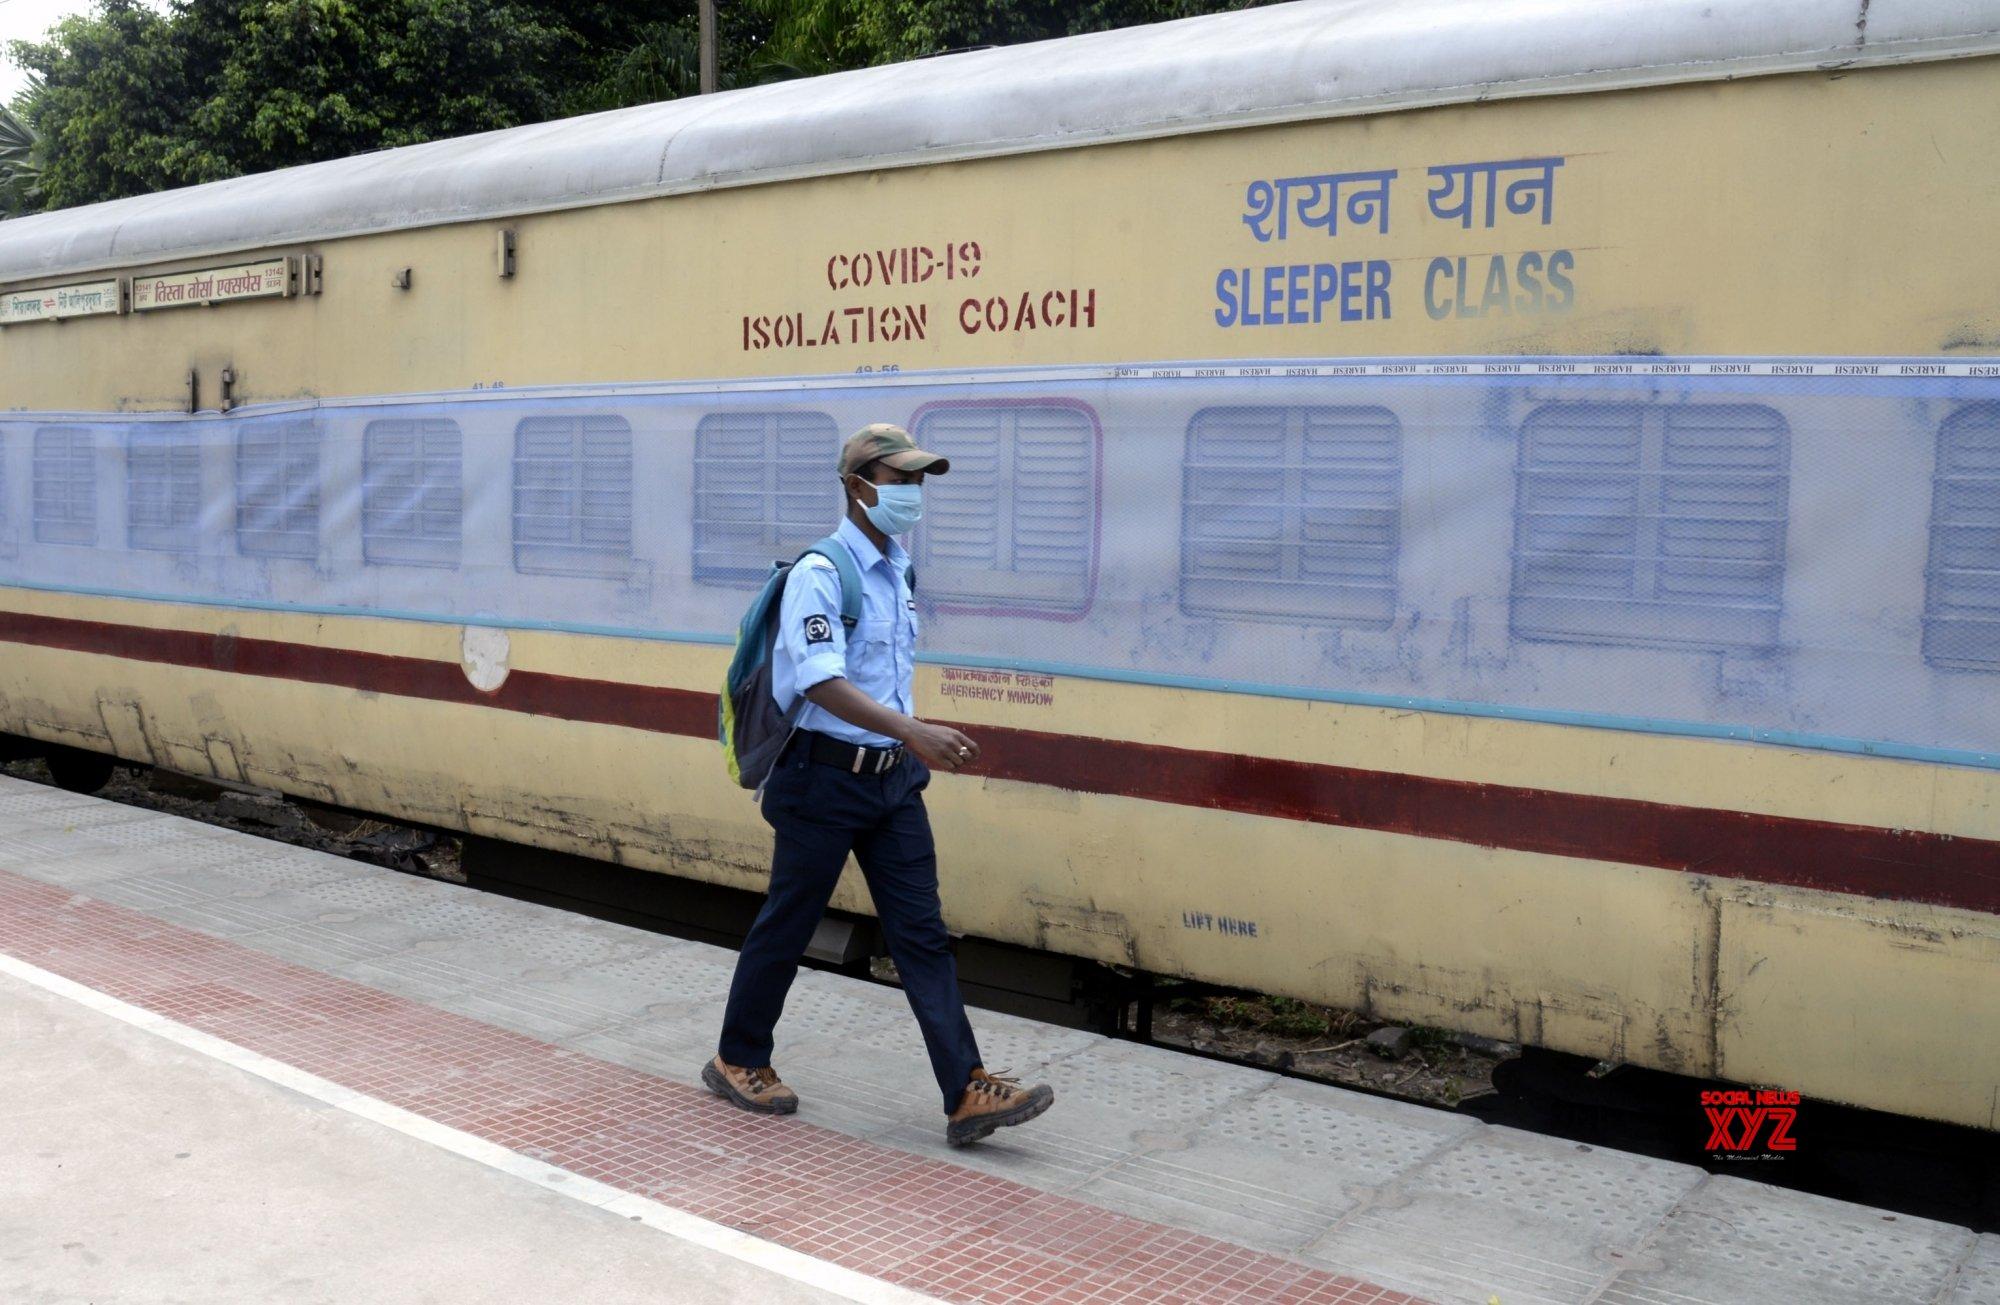 Railways to utilise 50% isolation coaches in Shramik trains